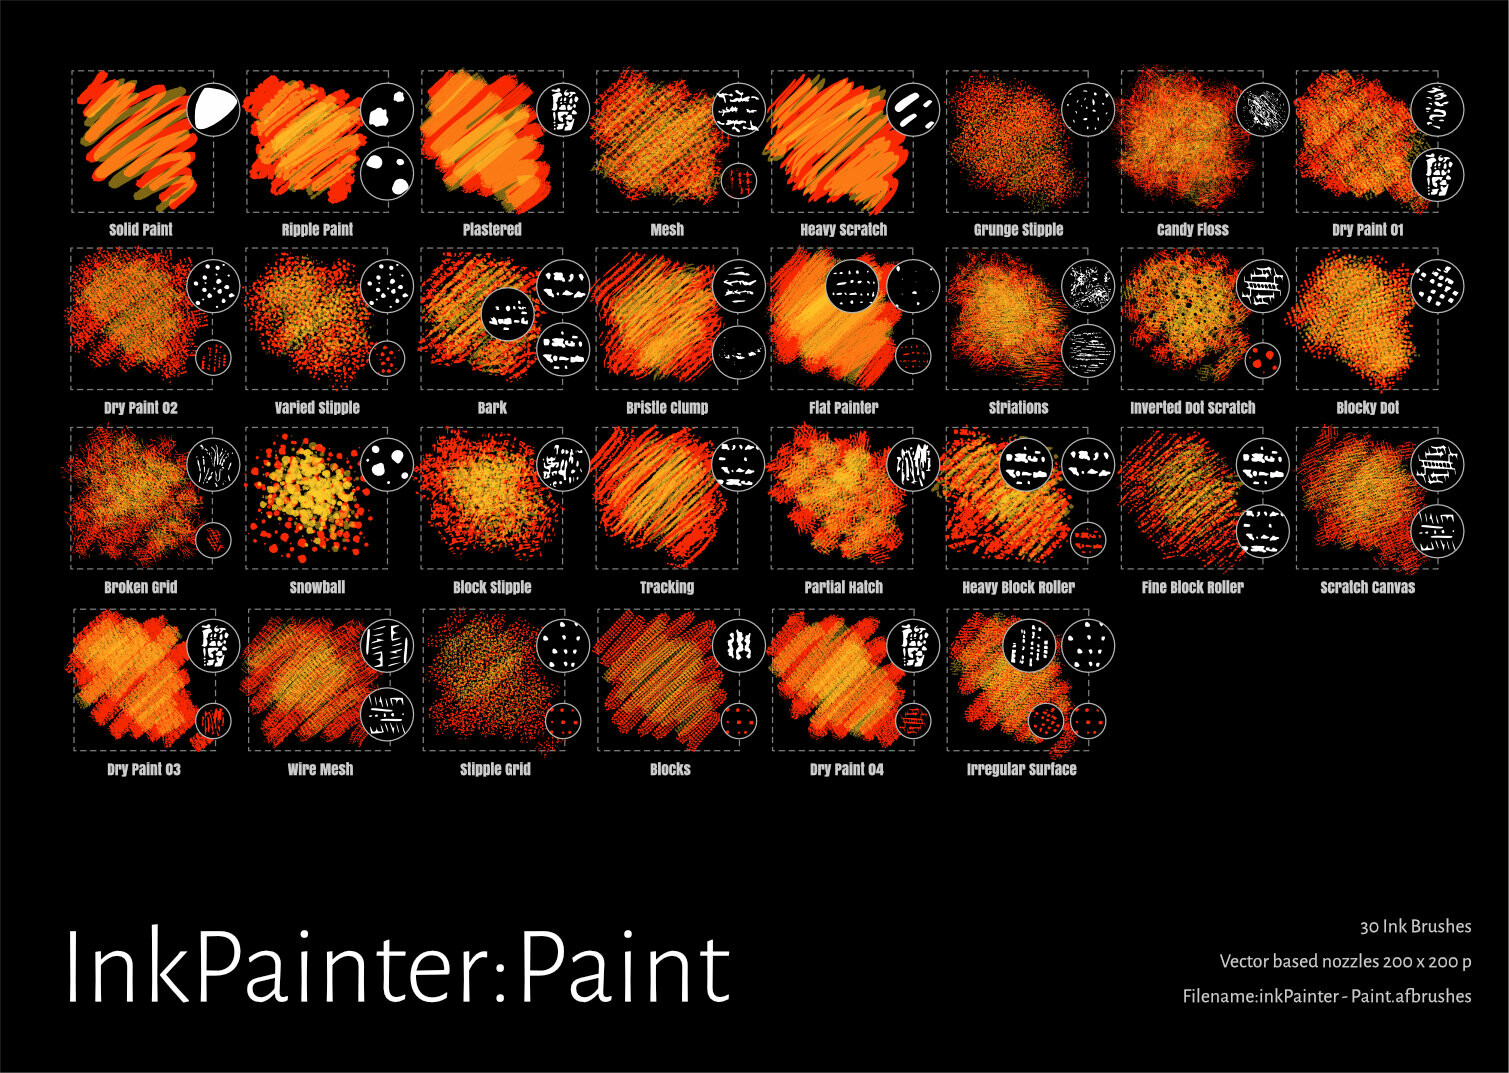 InkPainter Paint Brushes